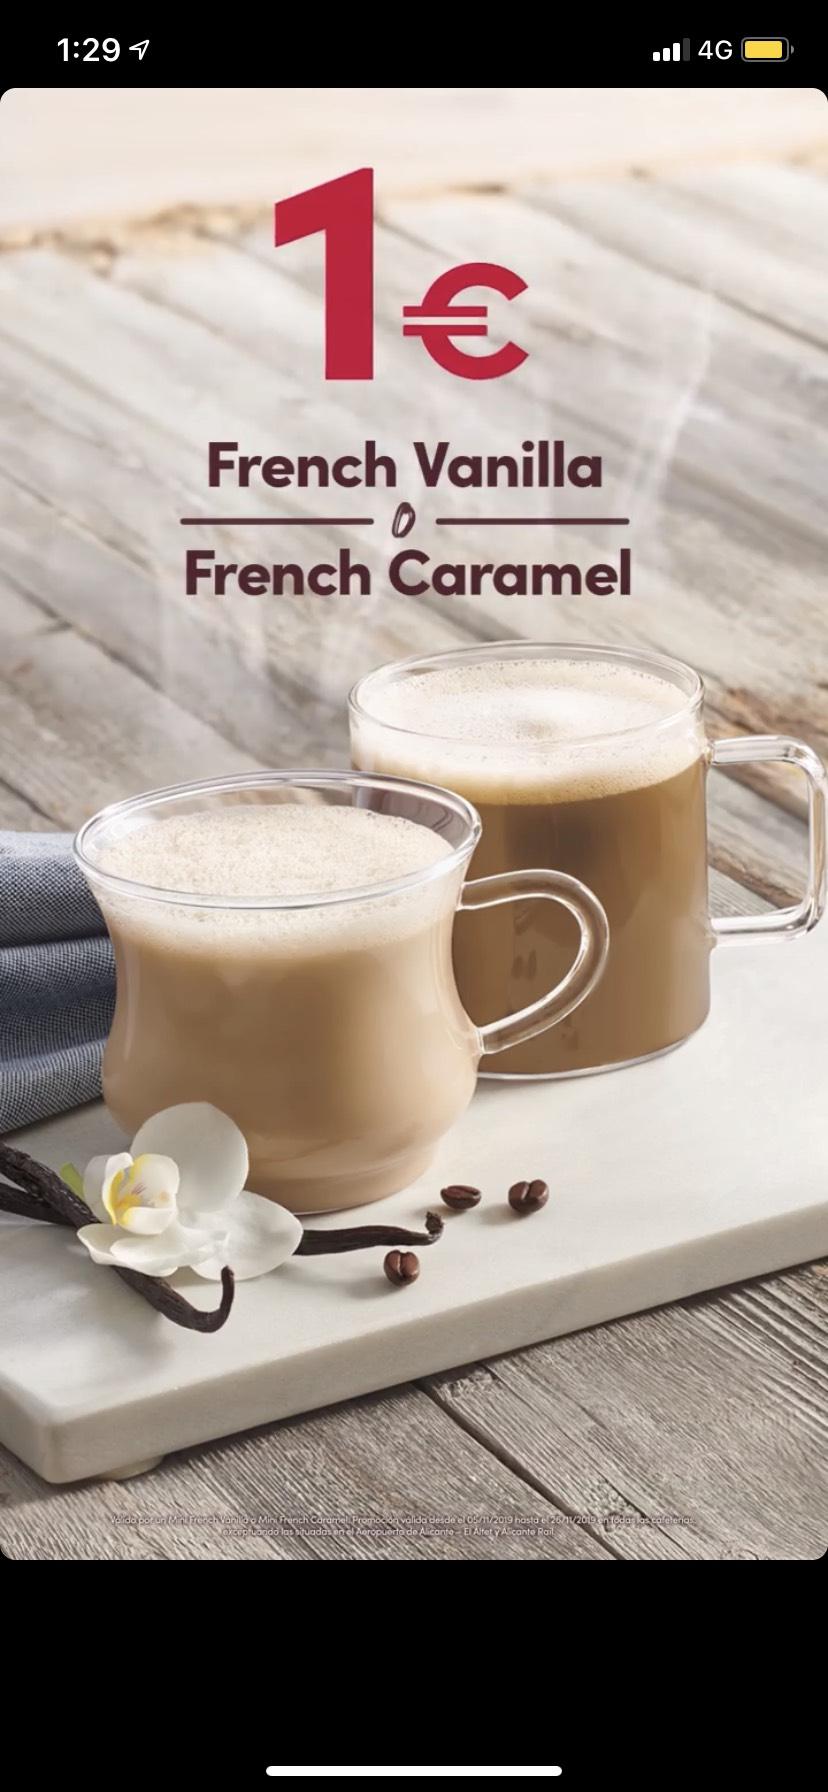 FRENCH VANILLA o FRENCH CARAMEL 1€